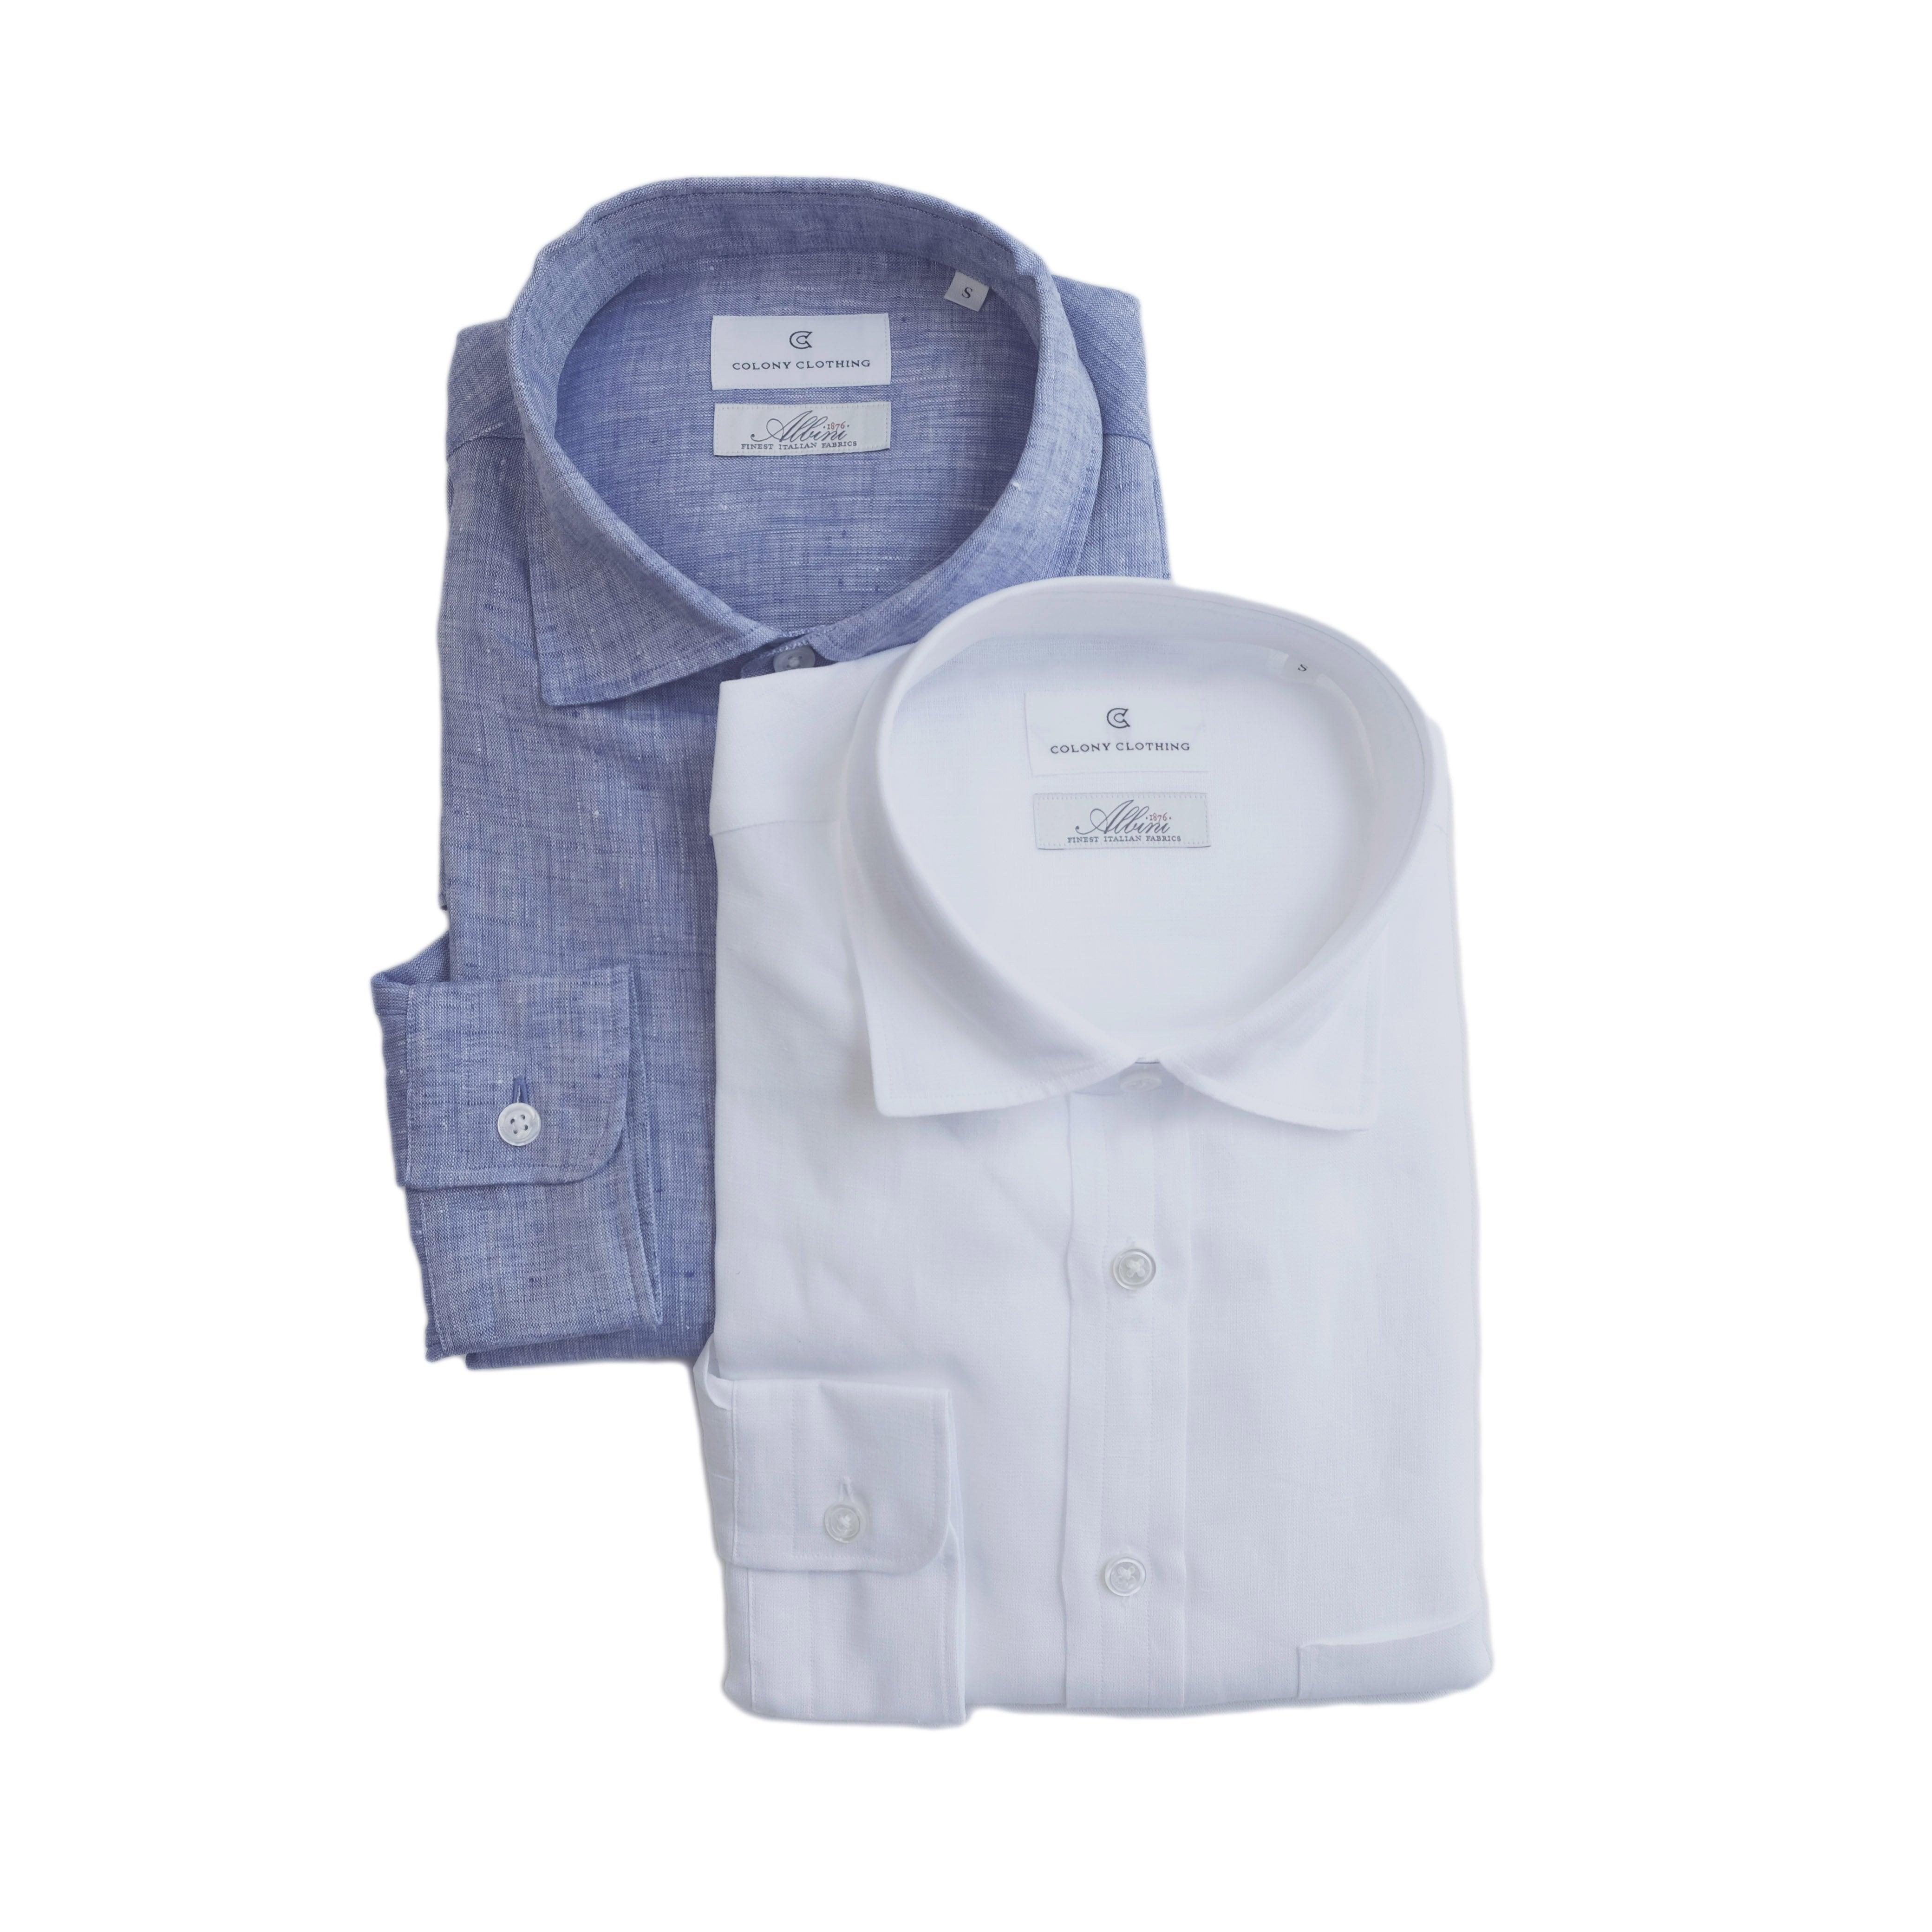 COLONY CLOTHING / ALBINI LINEN LOUNGE SHIRT / CC21-SH03(SALE)